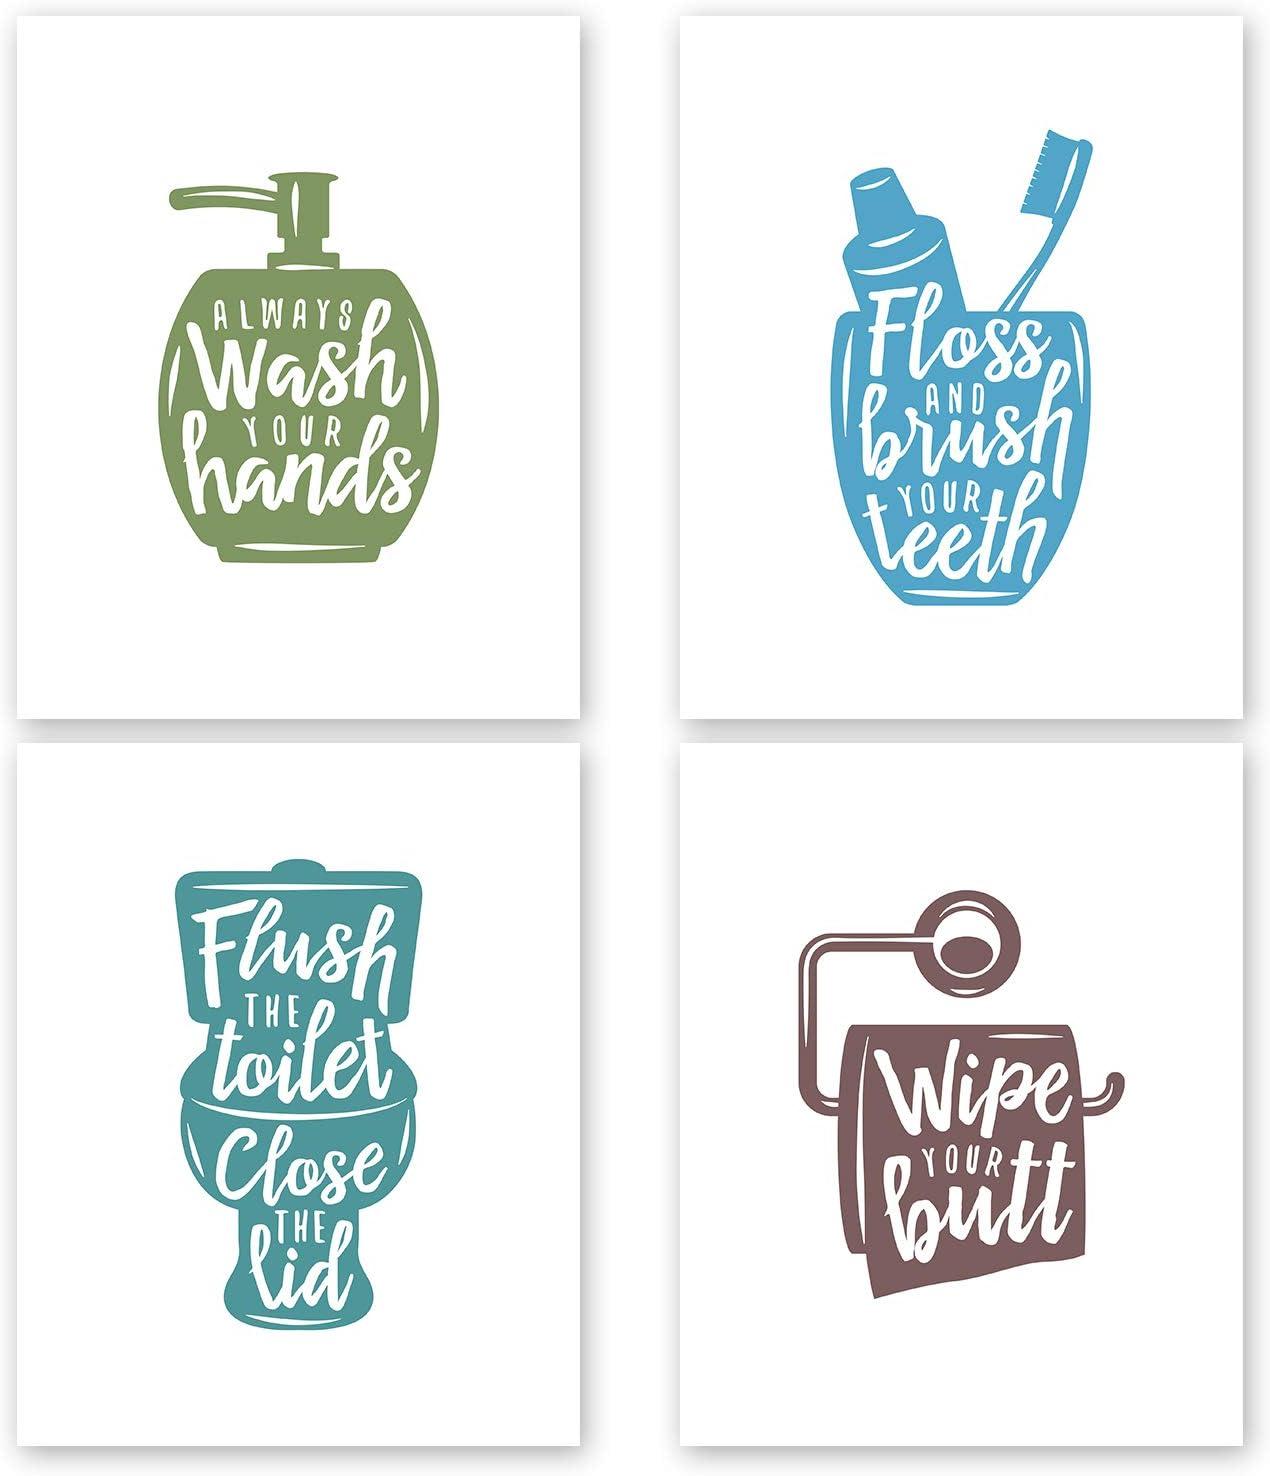 Nuah Prints Bathroom Wall Decor Prints, Set of 4 Toilet Quotes and Sayings Art Prints, Bath Decor Printed Photos, 8x10 inches (Set #2)